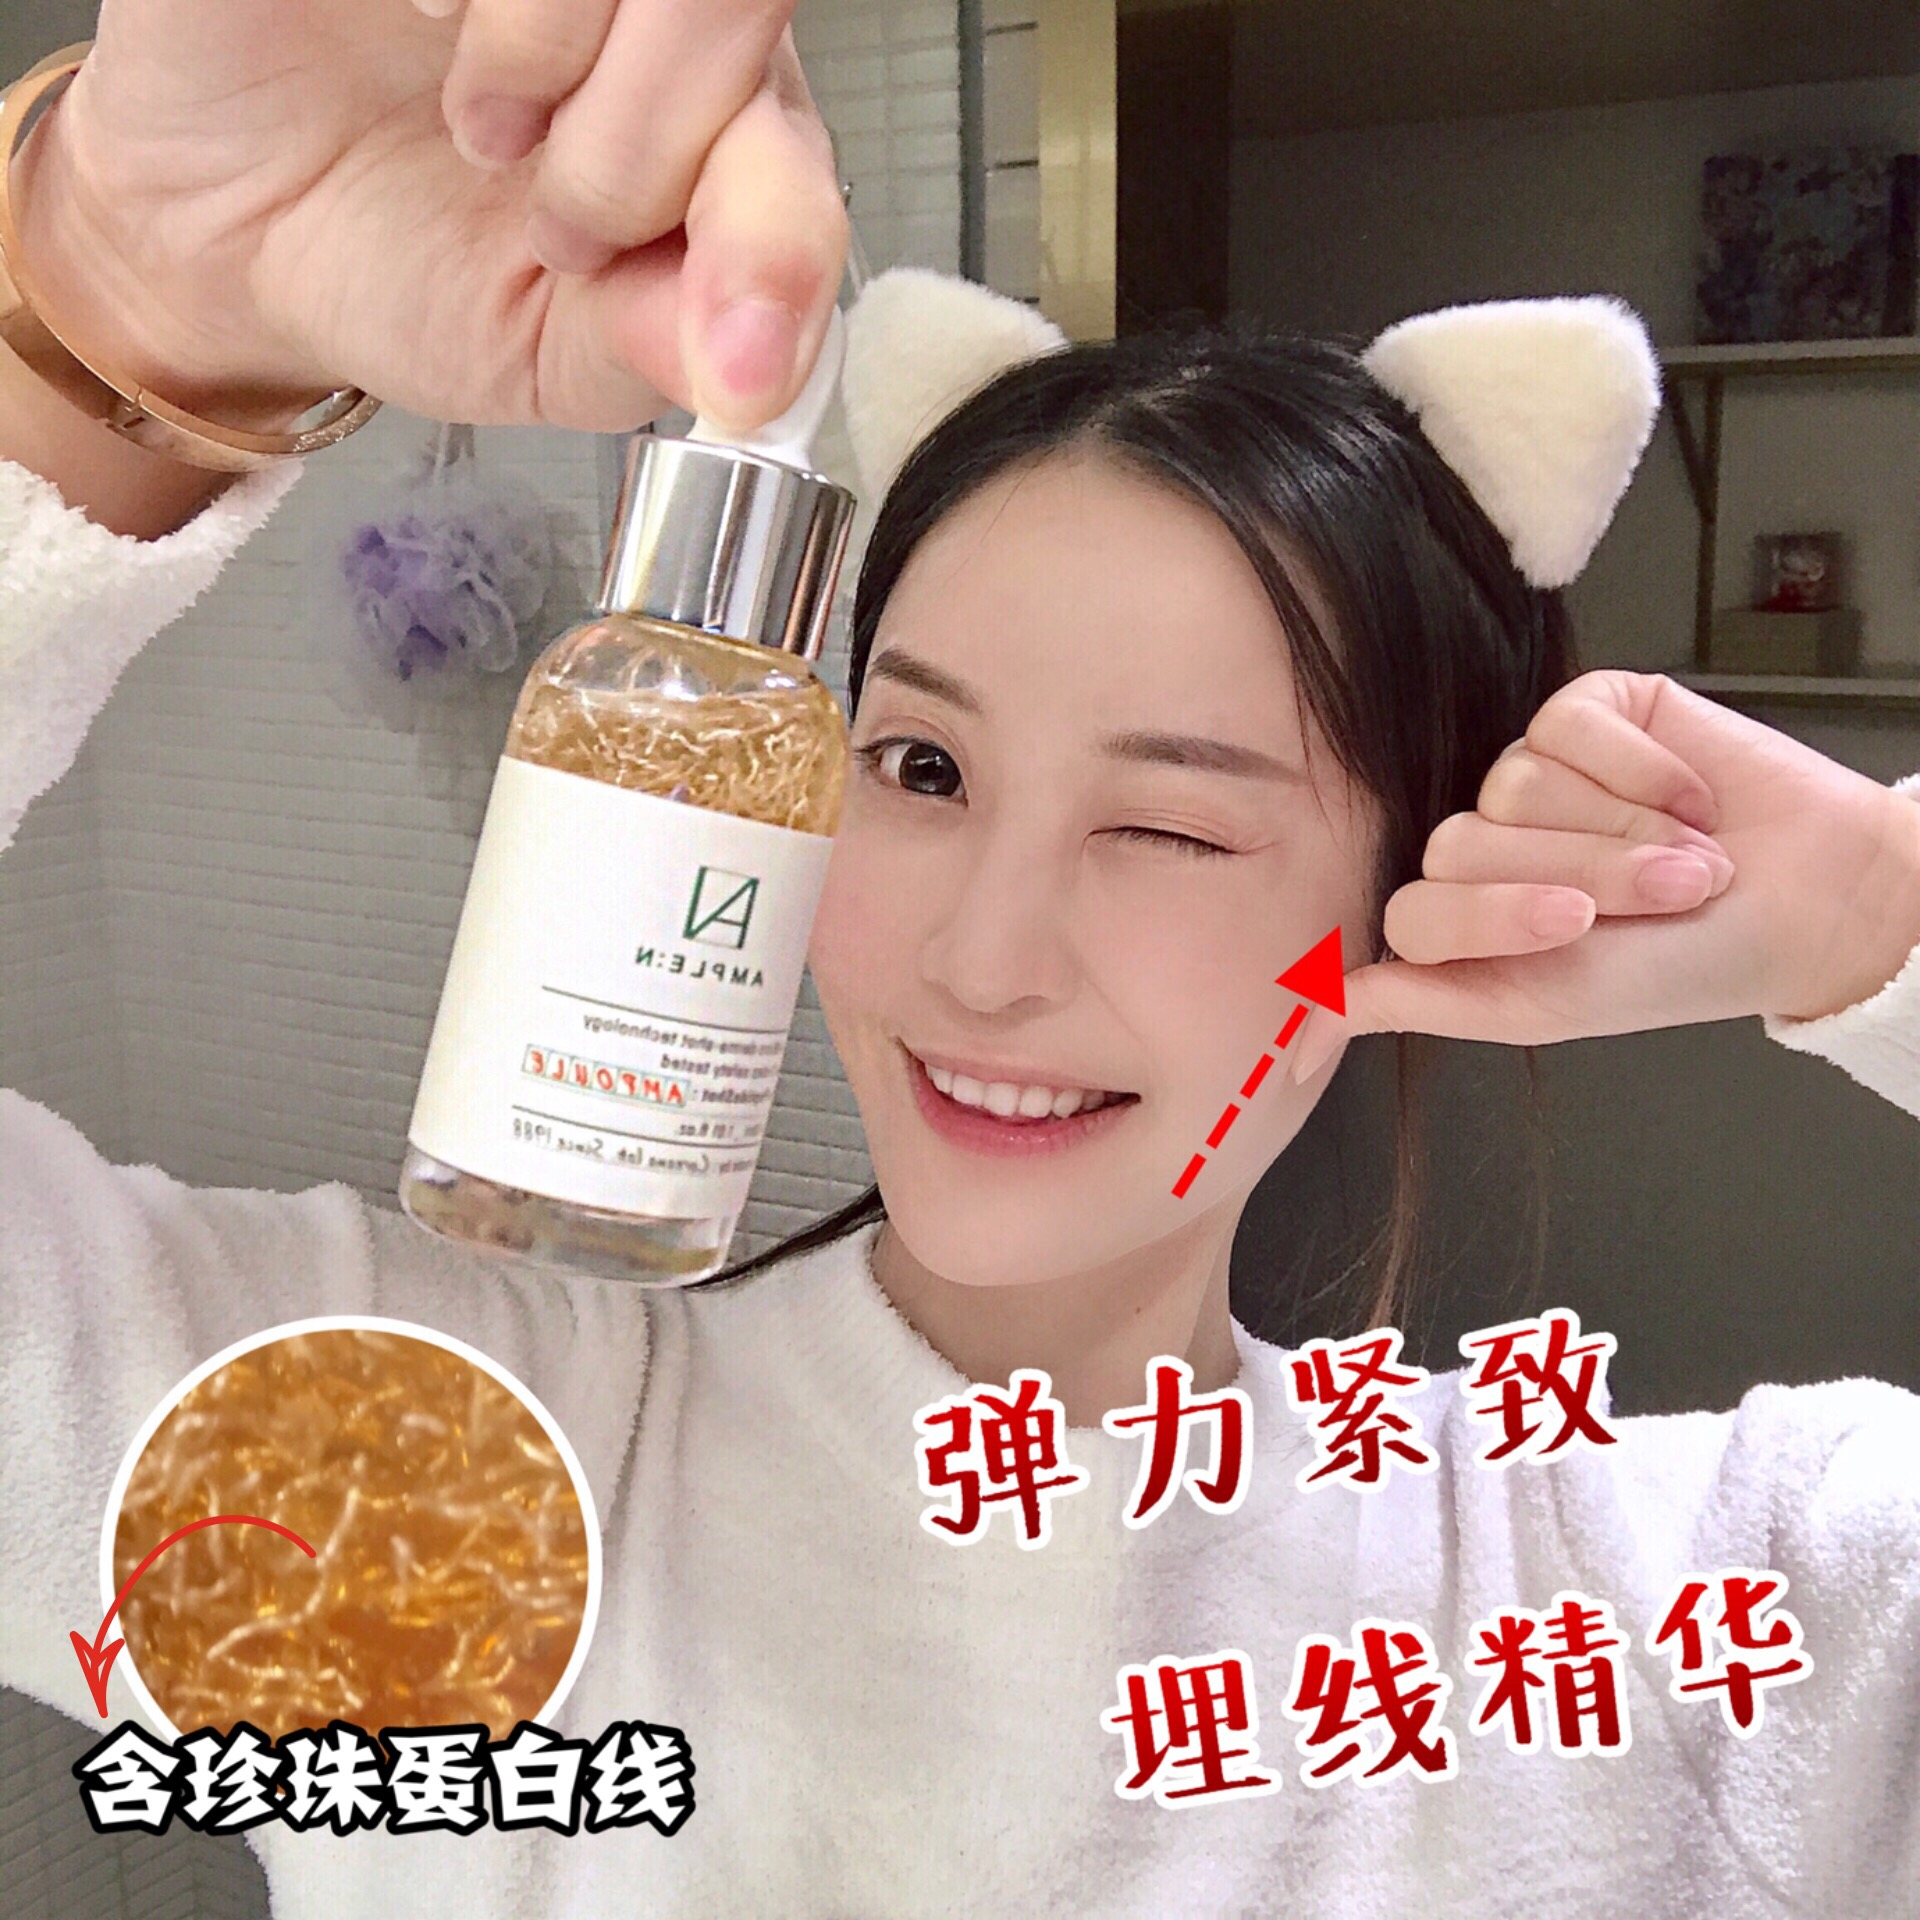 【Uni颖儿】韩国高丽雅娜精华AMPLE:N珍珠弹力线肽胶原蛋白30ml